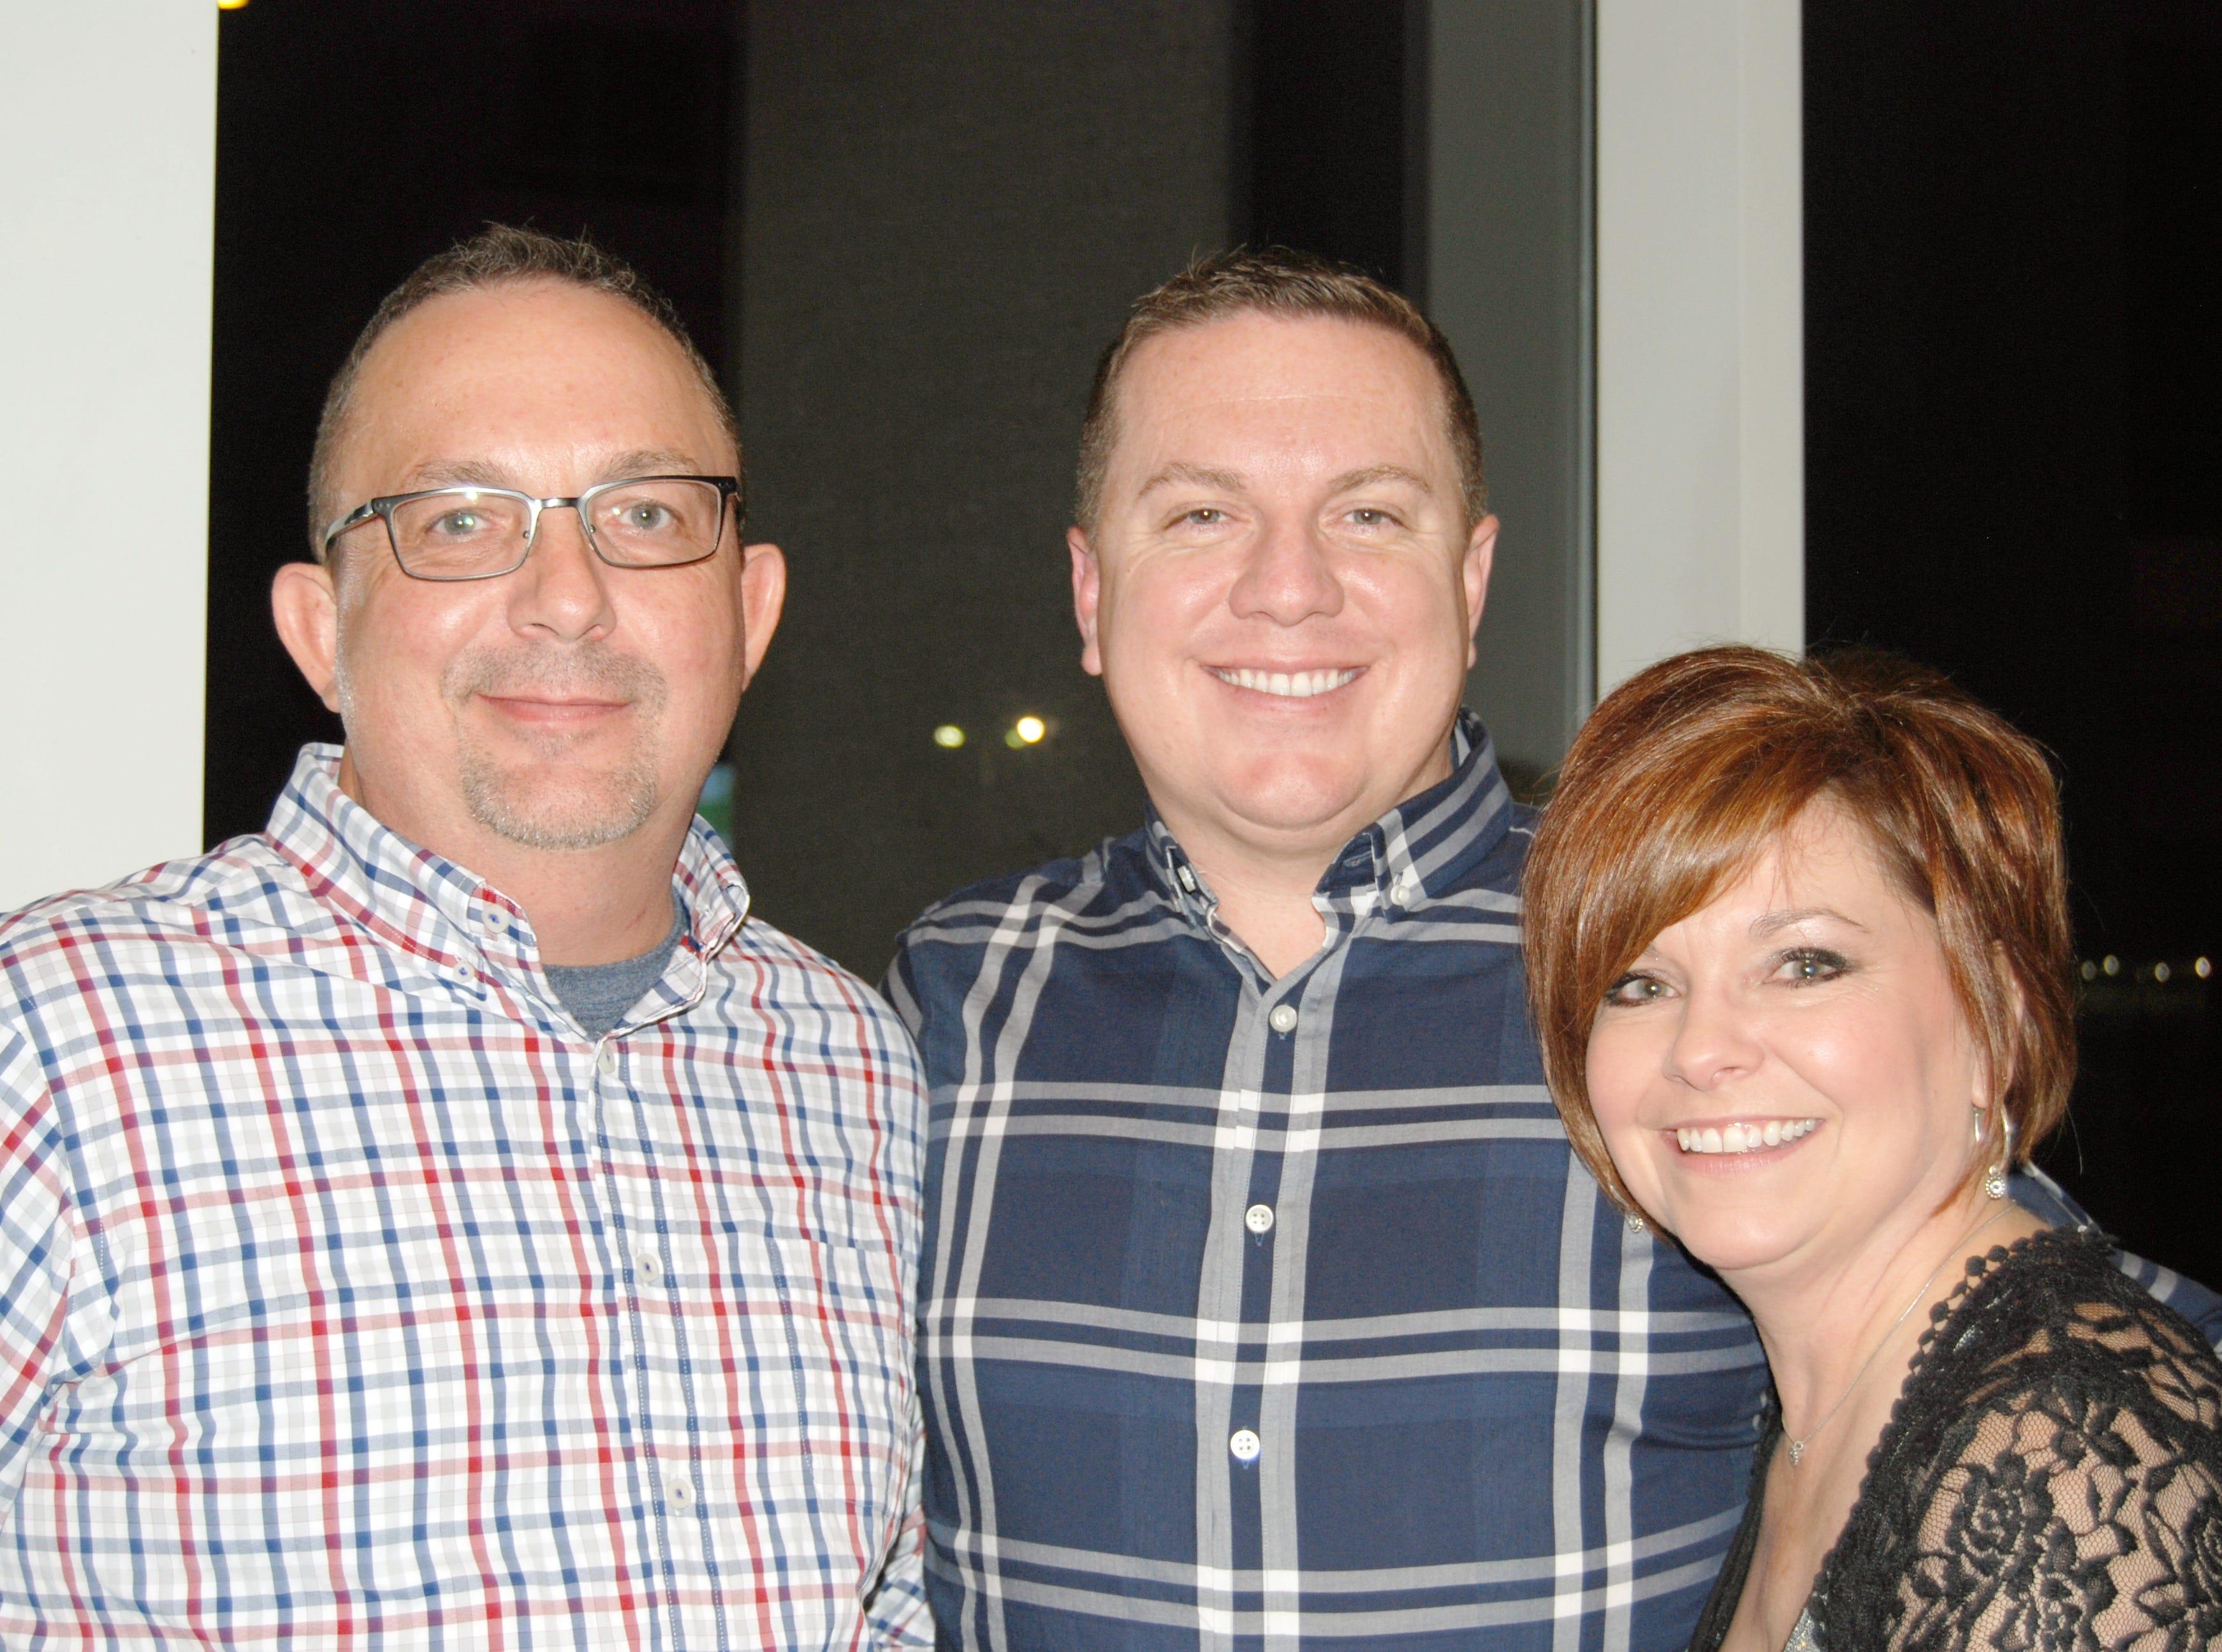 Travis Weatherman, Leonard Clinton and Cheryl Stone